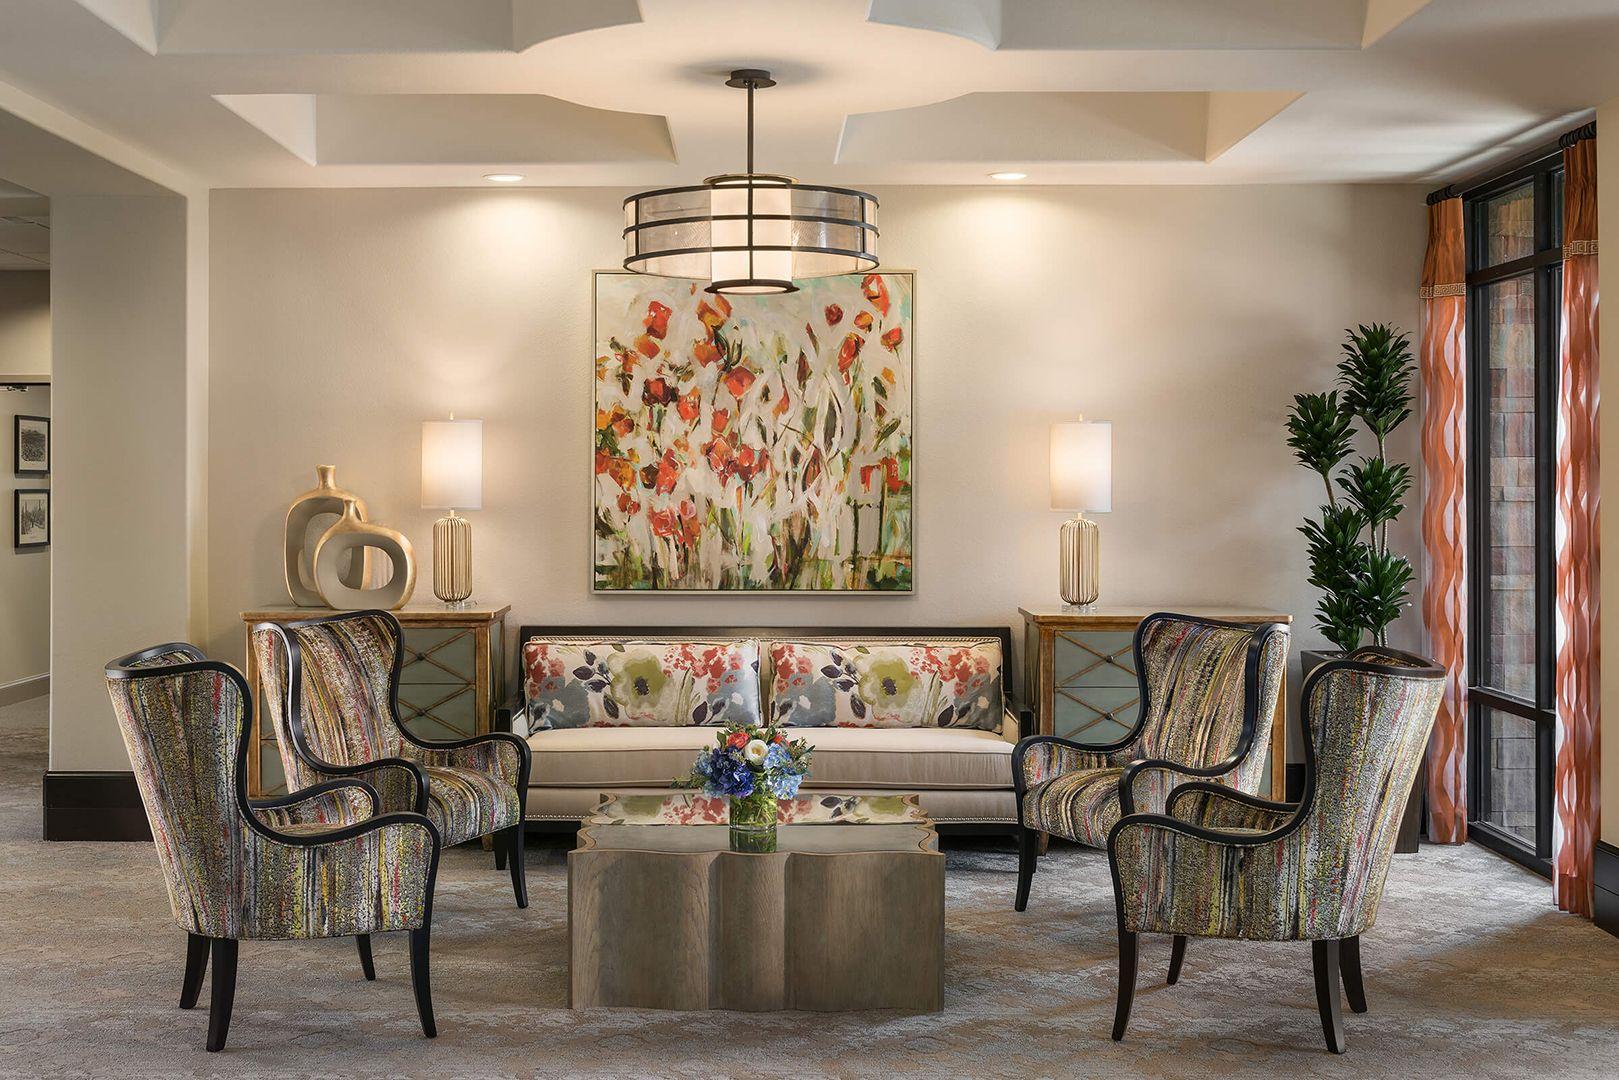 Our work national award winning senior housing interior design also rh pinterest